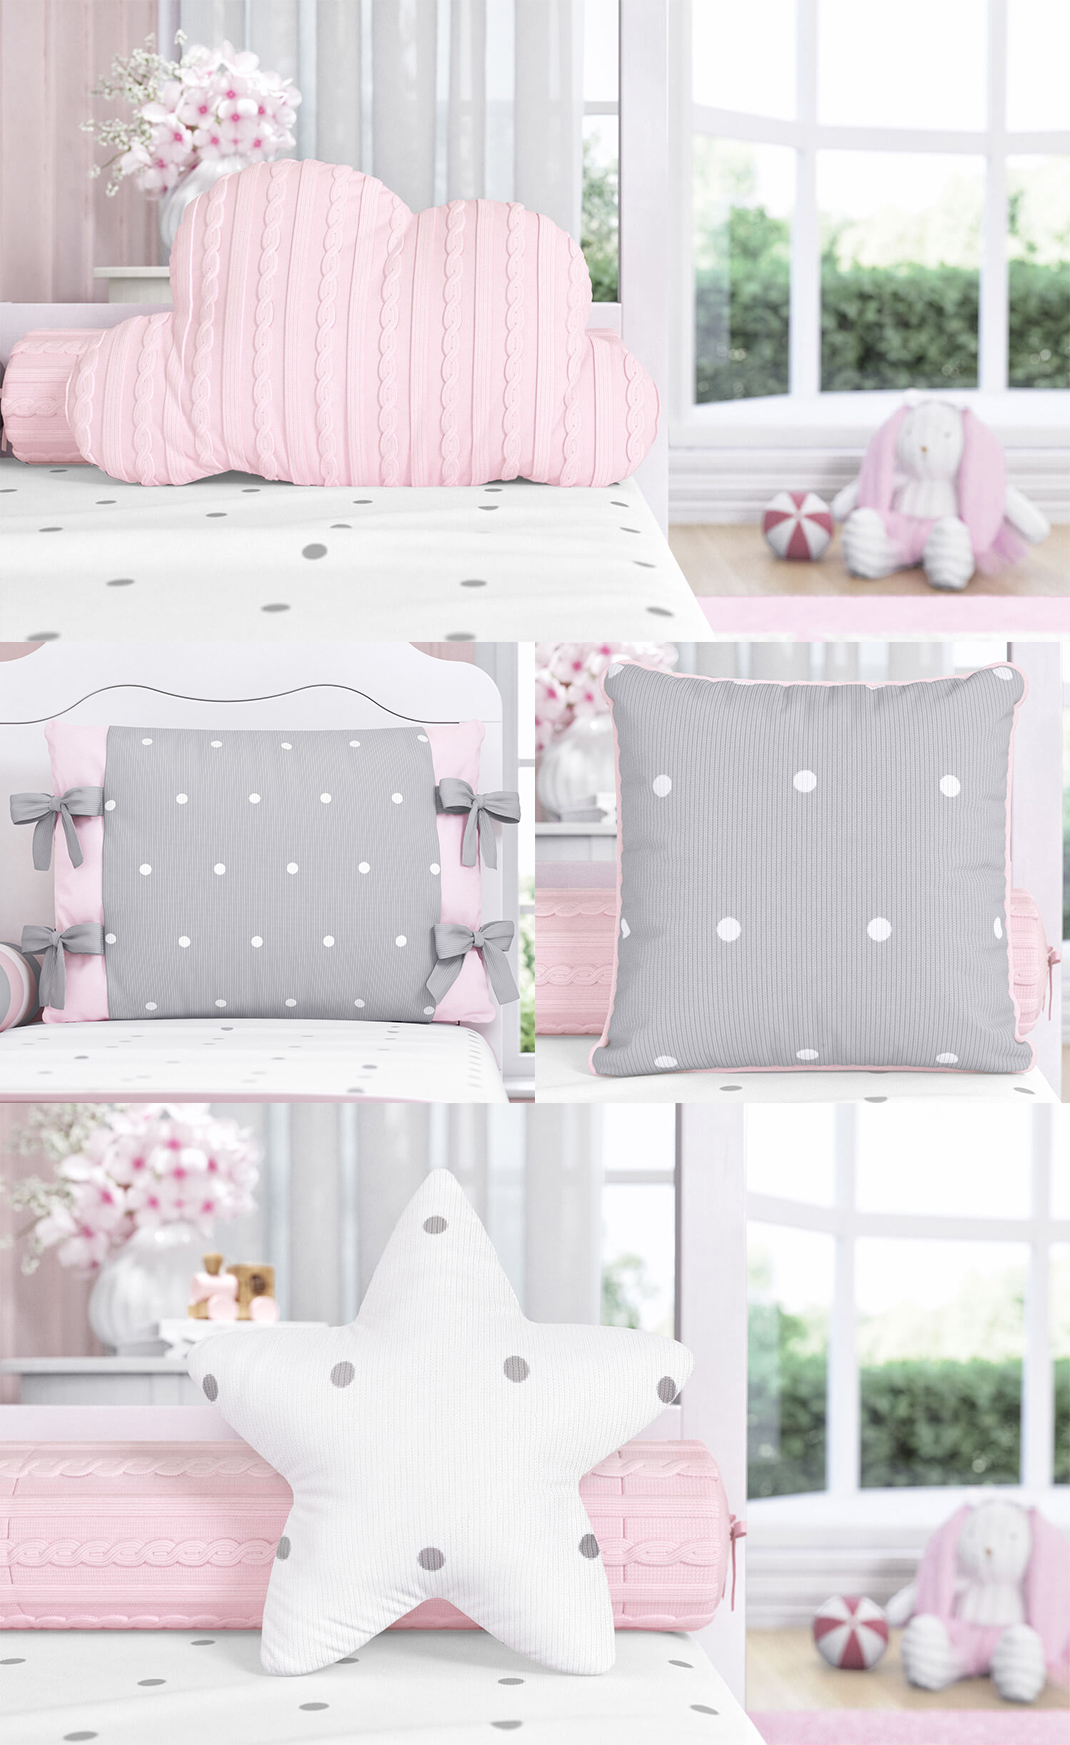 almofadas tricot poá rosa